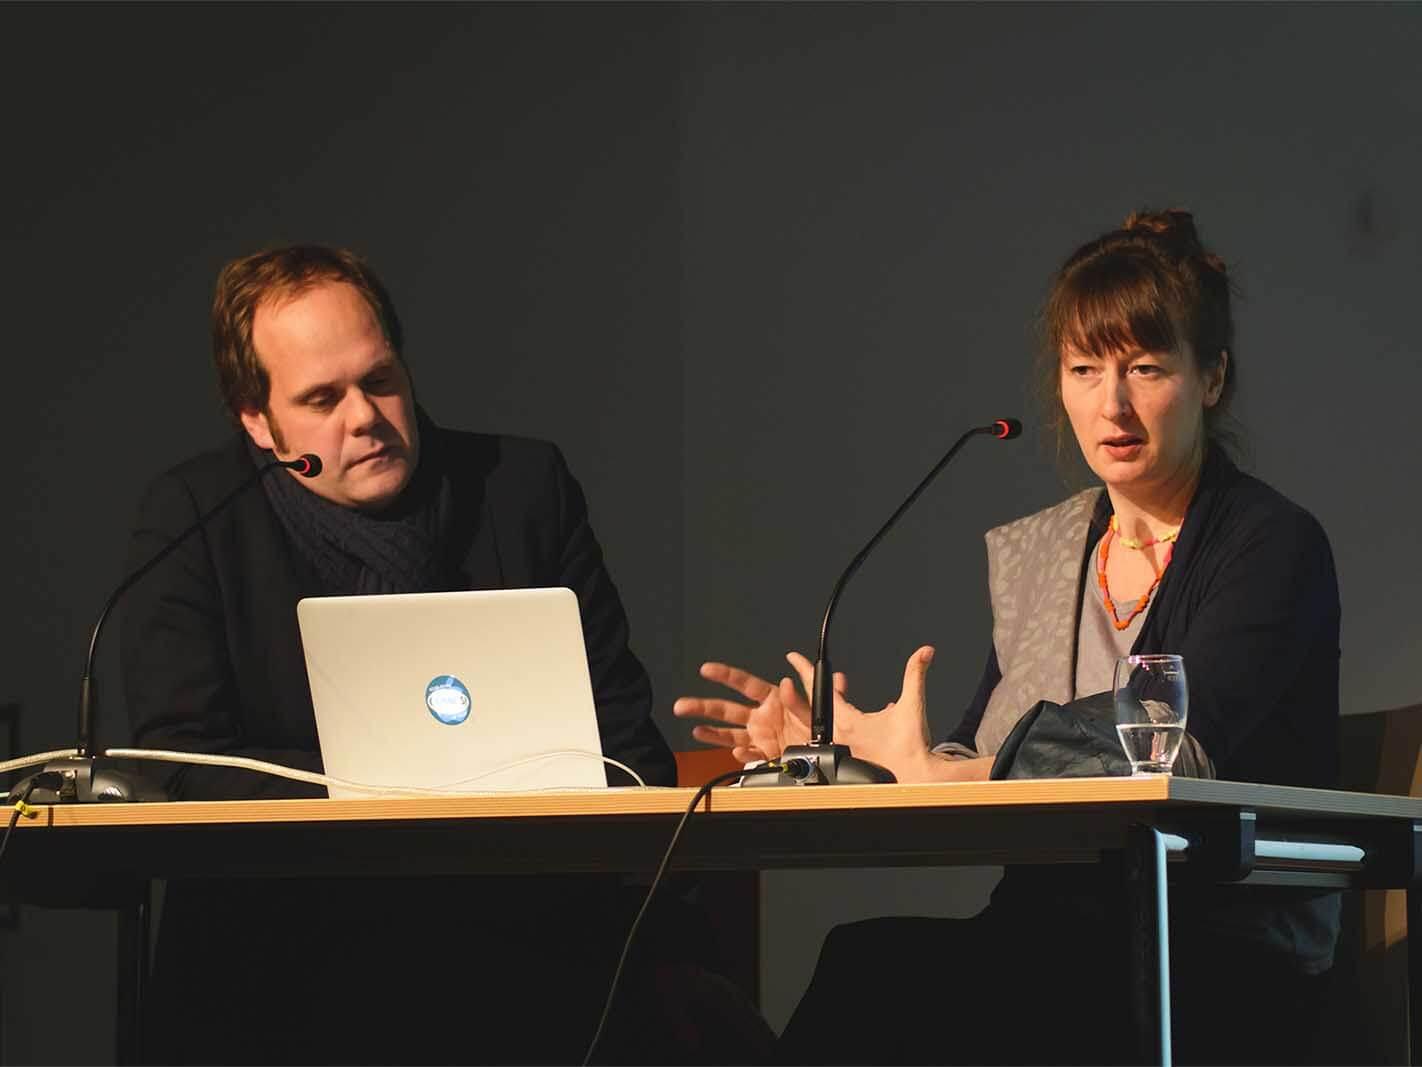 BR-Kulturredakteur Nils Beintker (li.) im Gespräch mit Barbara Yelin (li.).